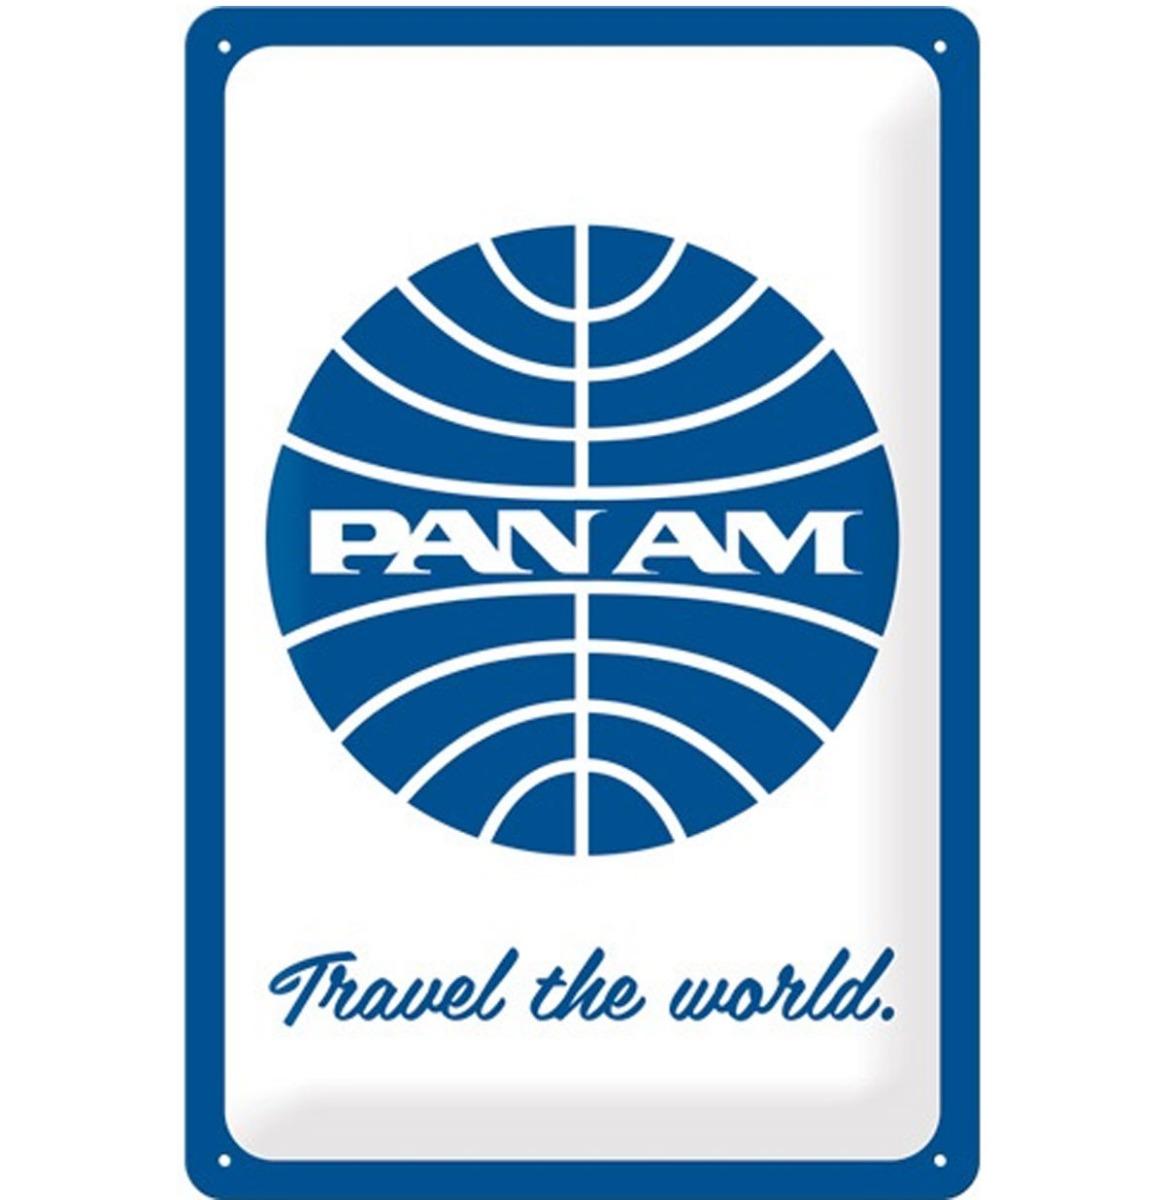 Pan Am Travel The World Metalen Bord - 20 x 30 cm